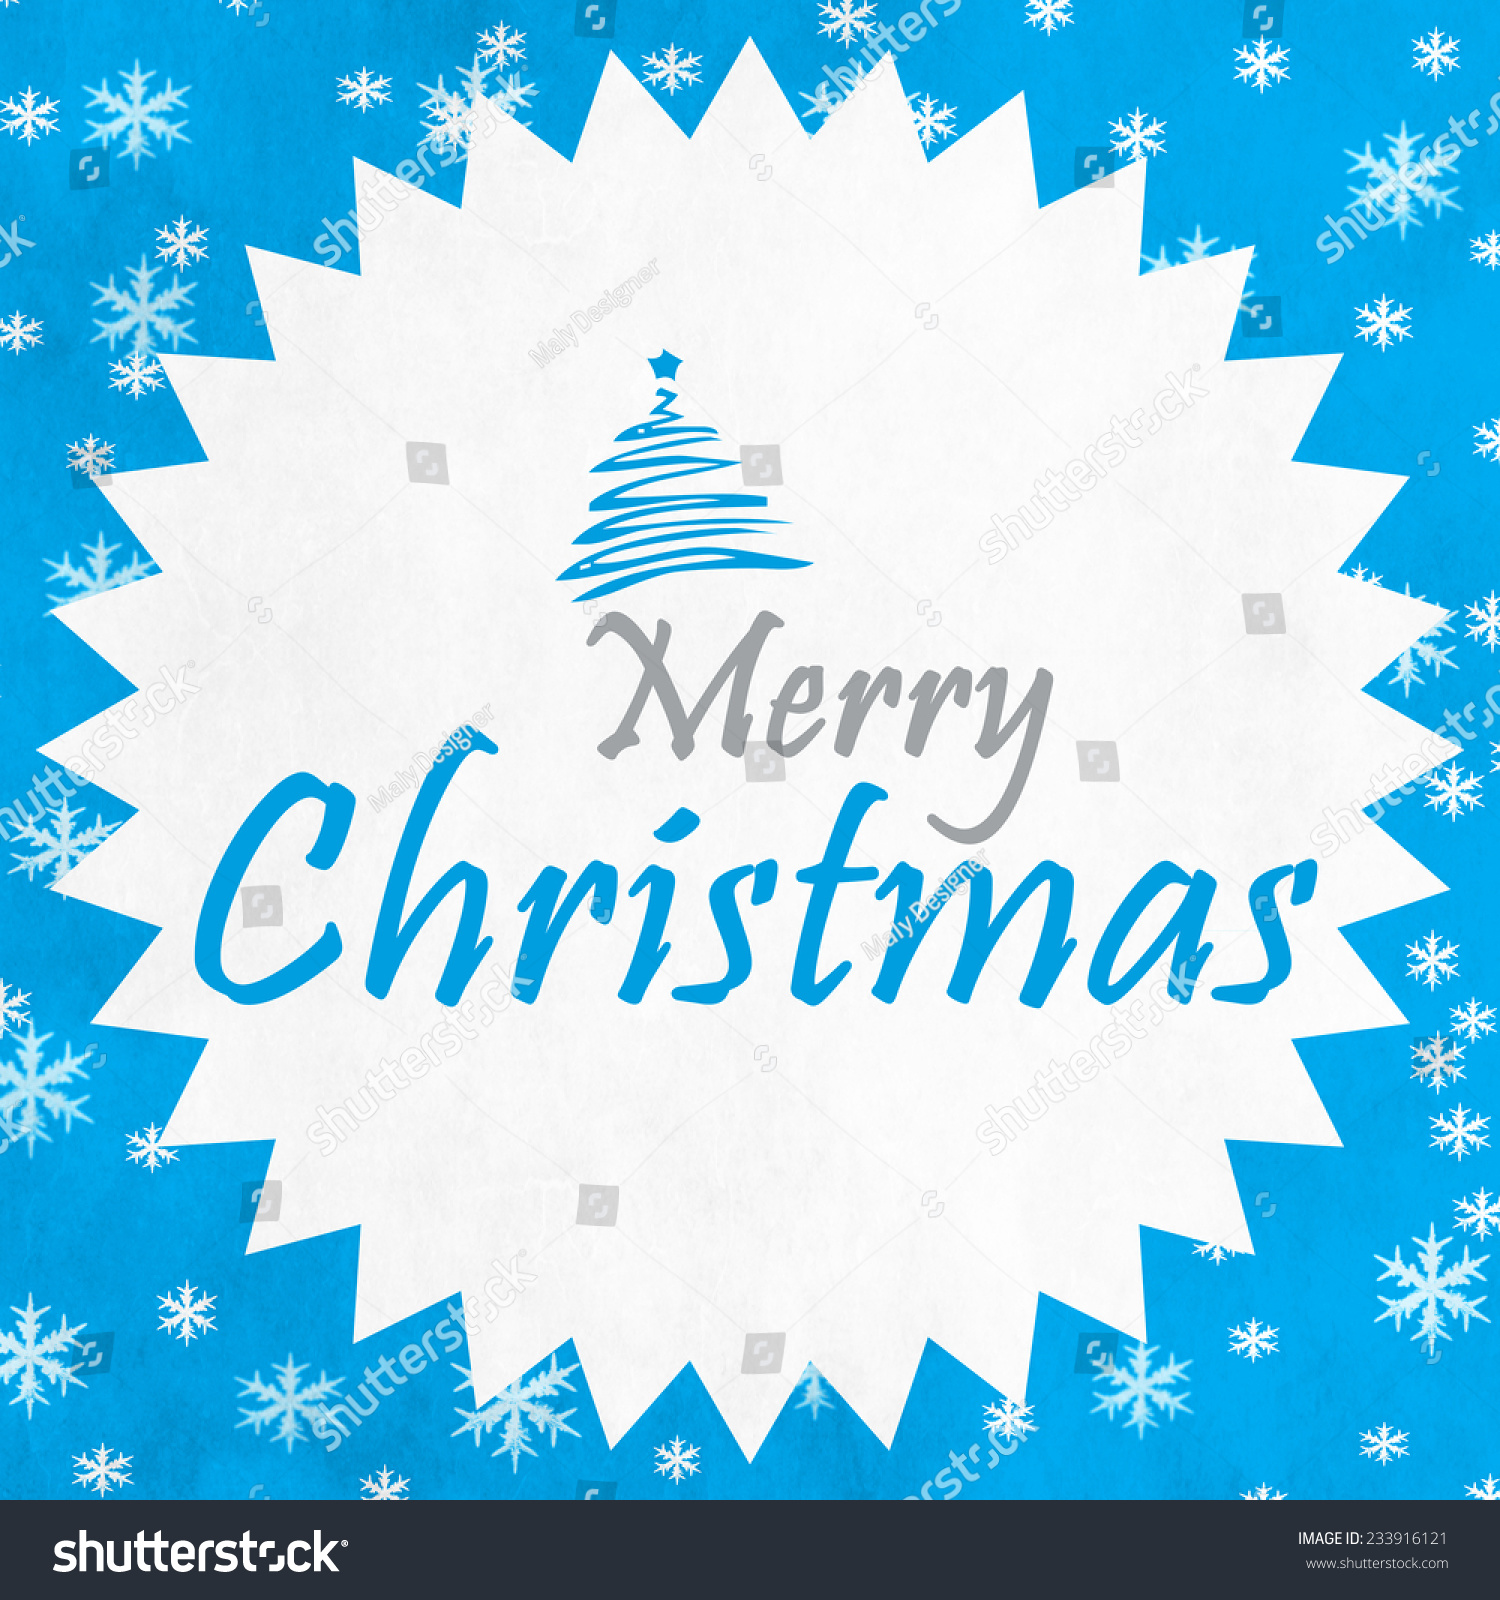 Merry christmas season greetings quote stock illustration merry christmas season greetings quote kristyandbryce Choice Image